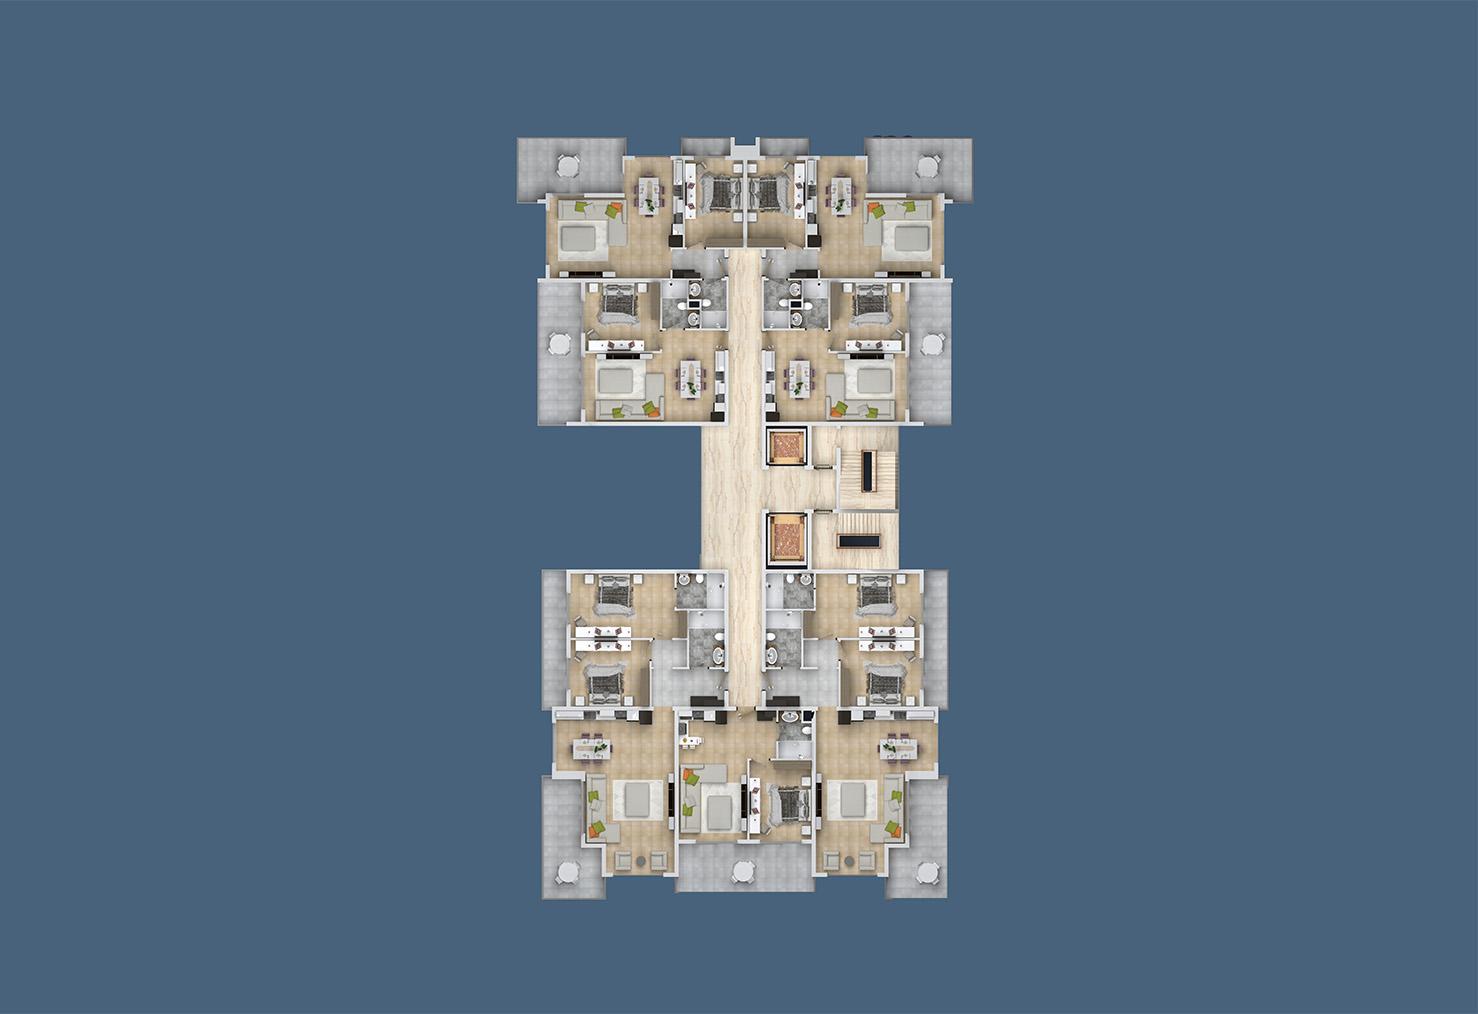 Floor plans of apartments 4 floor «C» Yekta Kingdom Trade Center